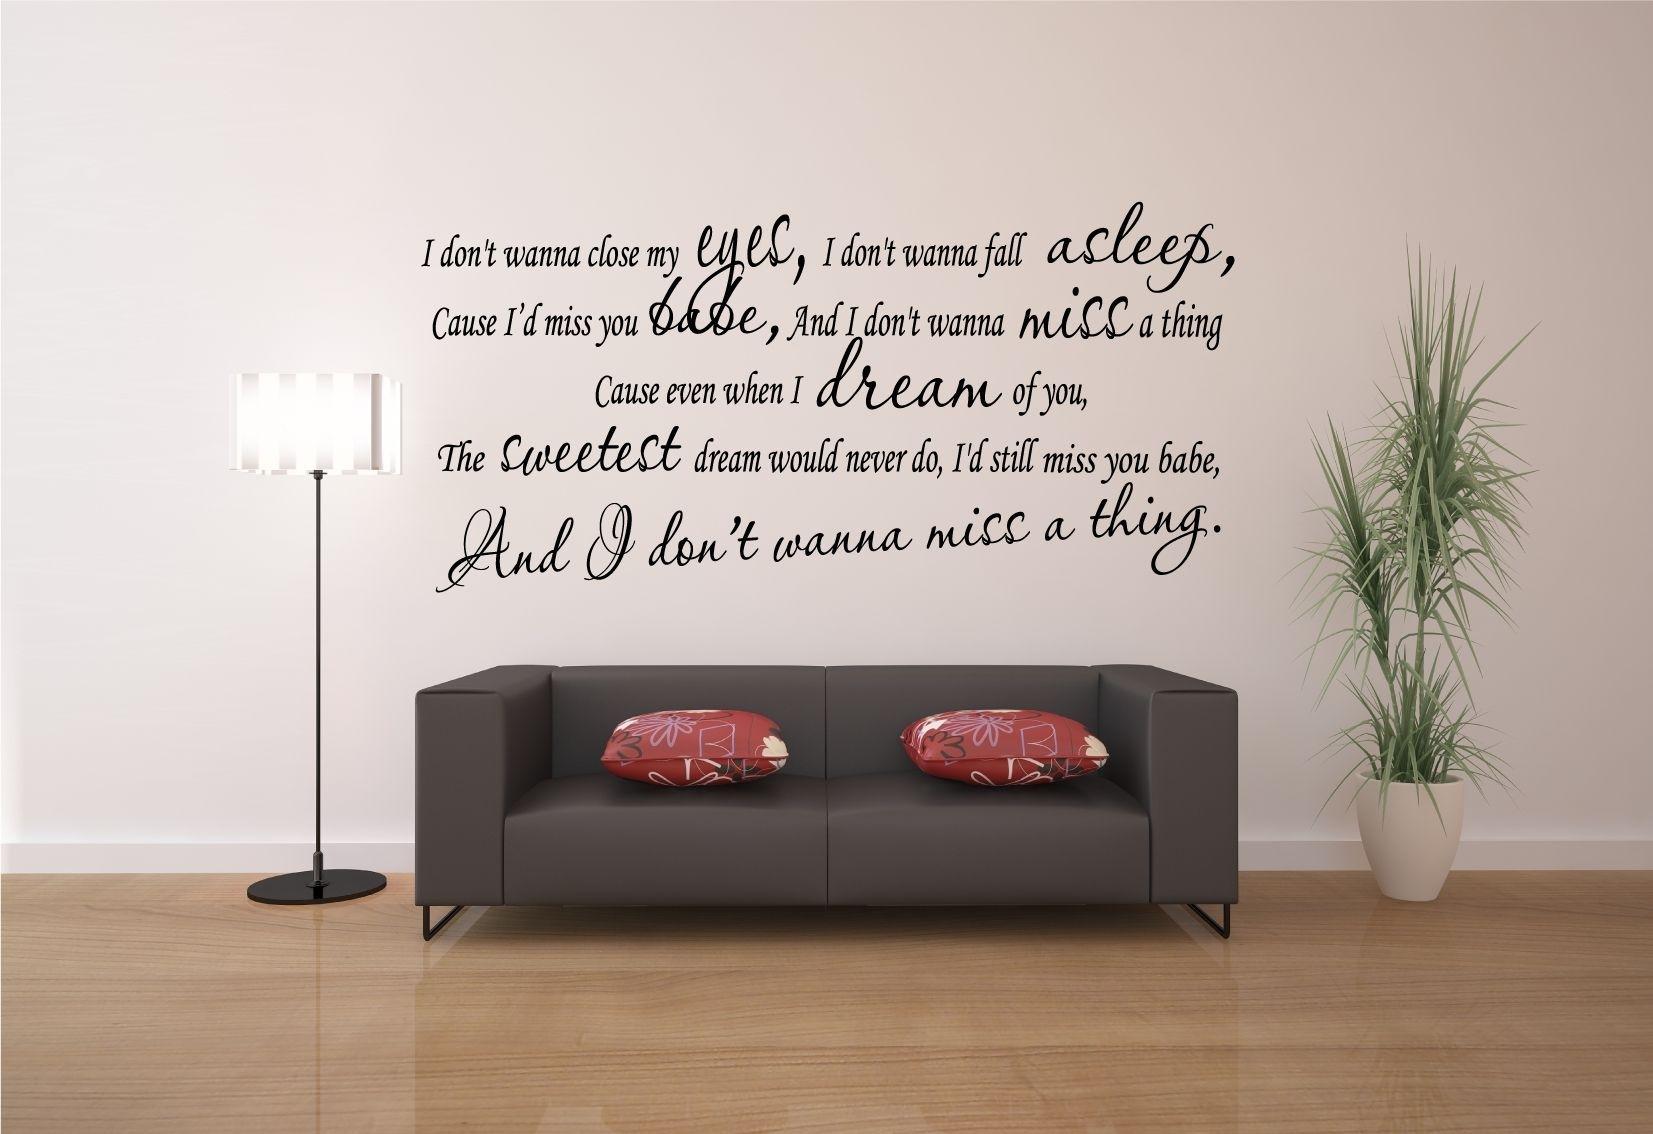 Aerosmith-I-Don-T-Wanna-Close-My-Eyes-Song-Lyrics-Wall-Art-Decal throughout Song Lyric Wall Art (Image 2 of 20)